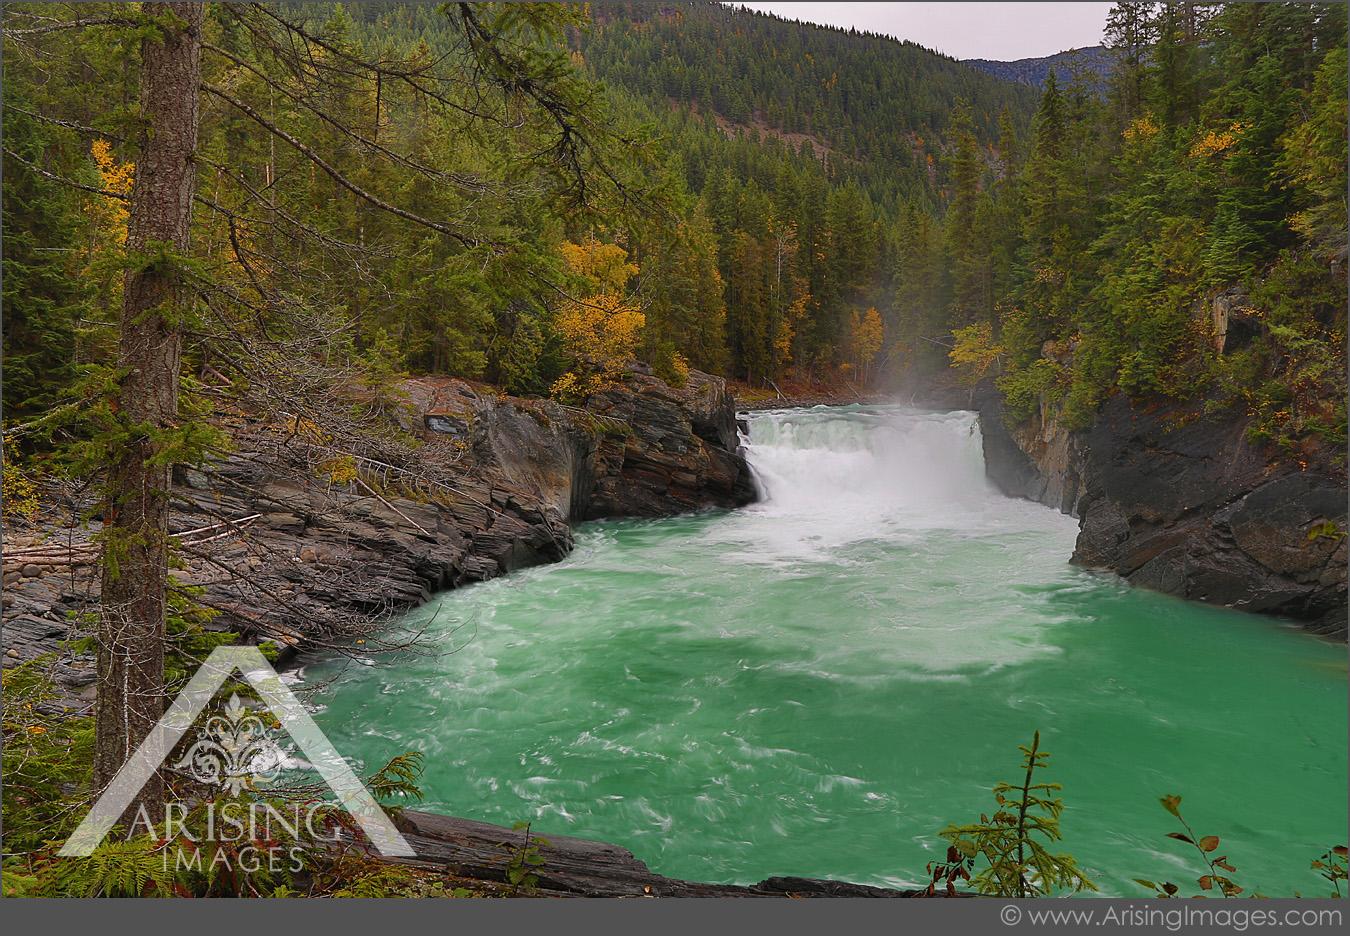 Rearguard Falls, Jasper National Park